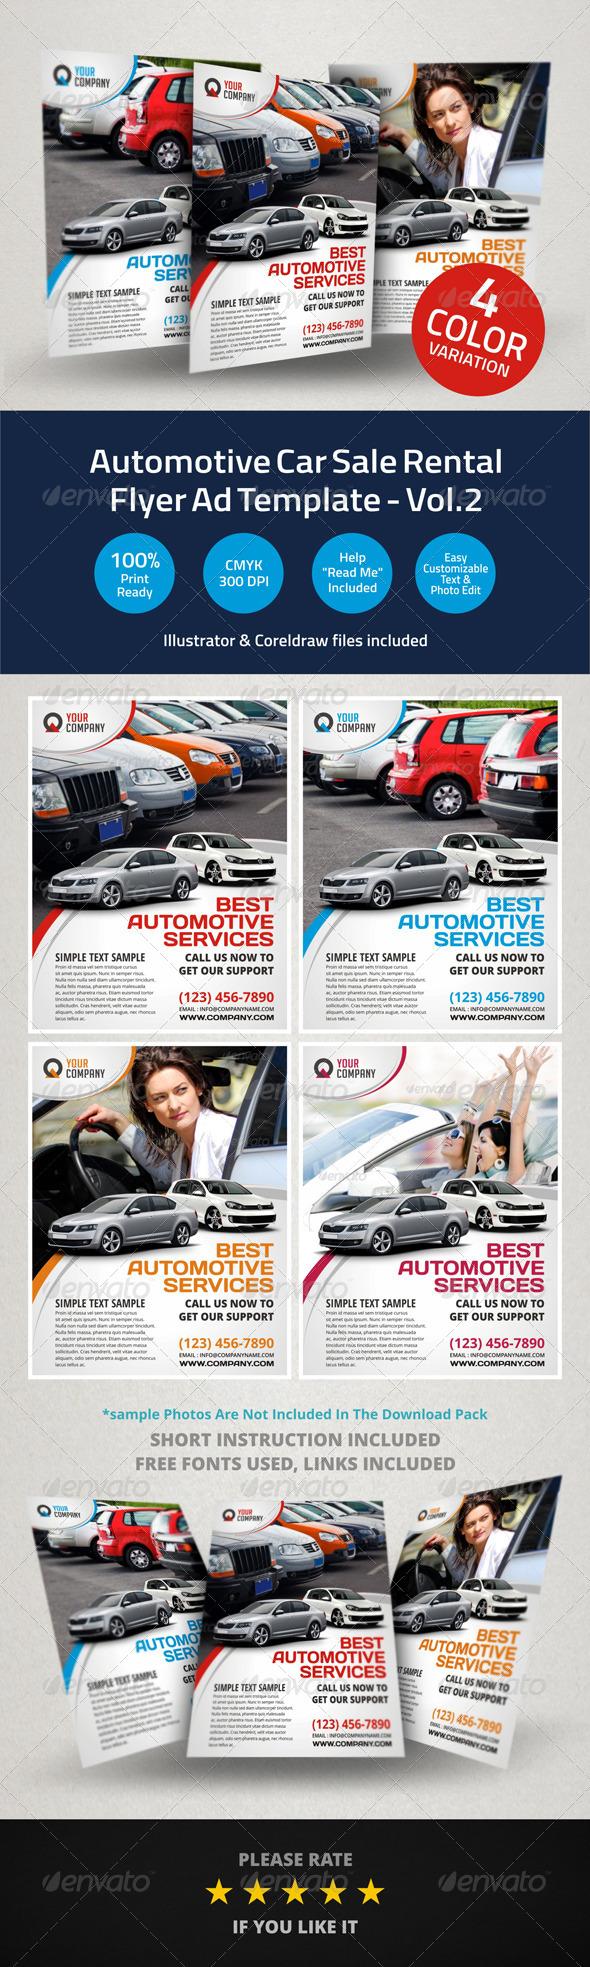 GraphicRiver Automotive Car Sale Rental Flyer Ad v2 6009249